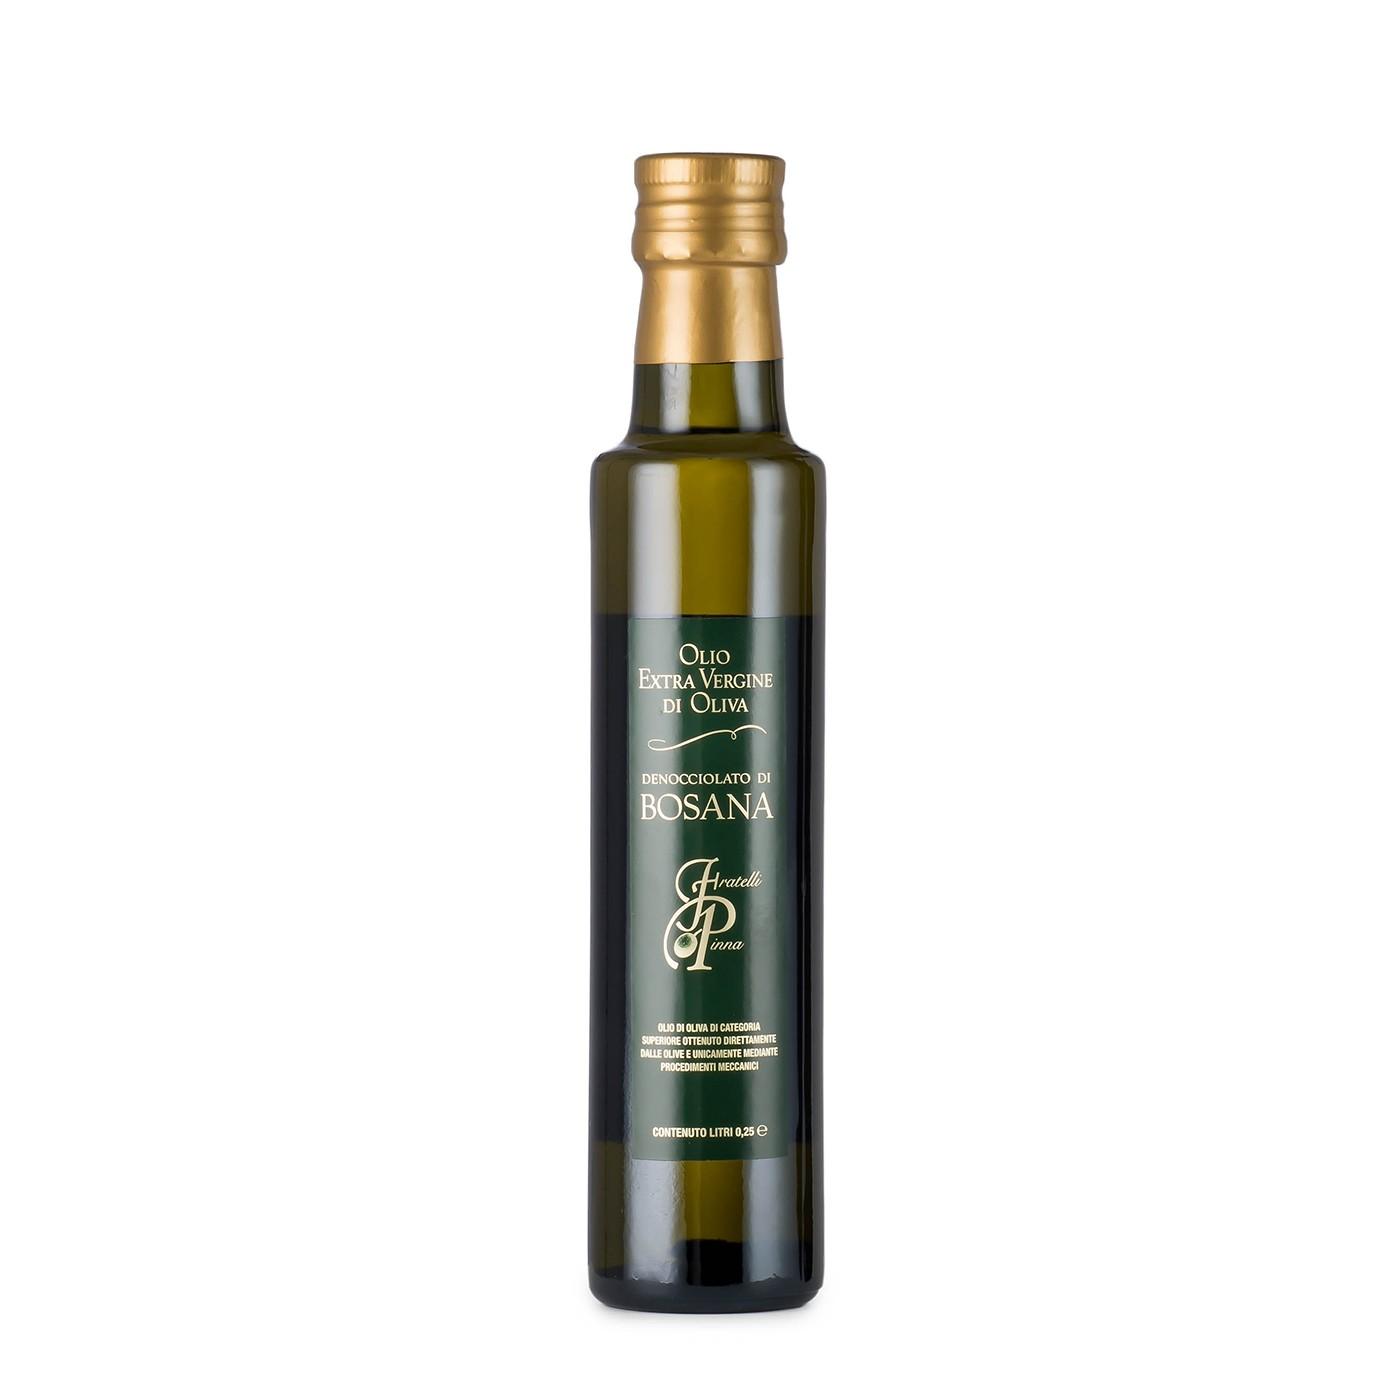 Denocciolato Bosana Extra Virgin Olive Oil 8.5 oz